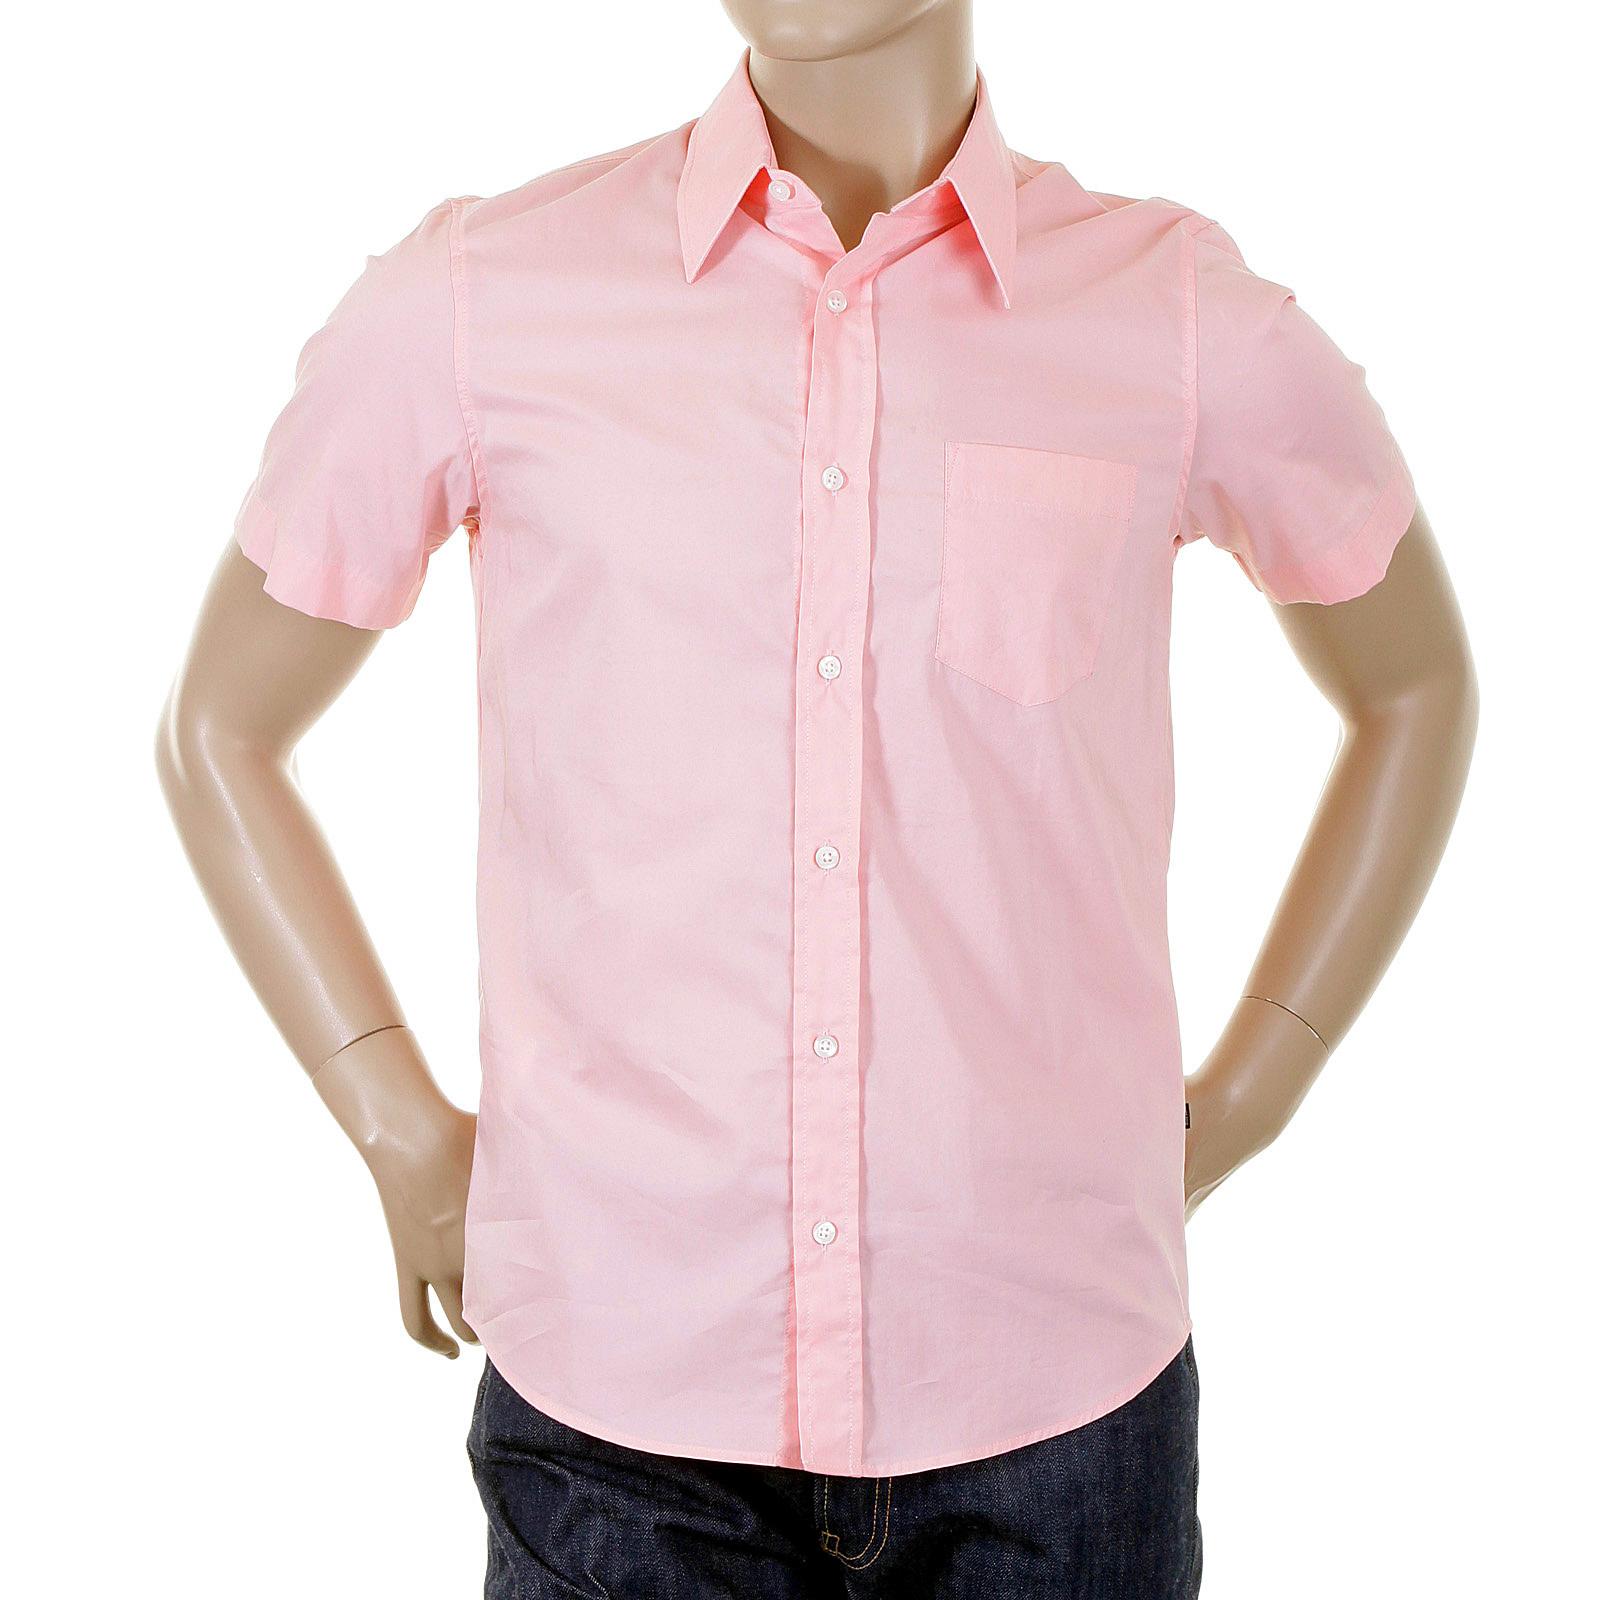 salmon pink shirt is shirt